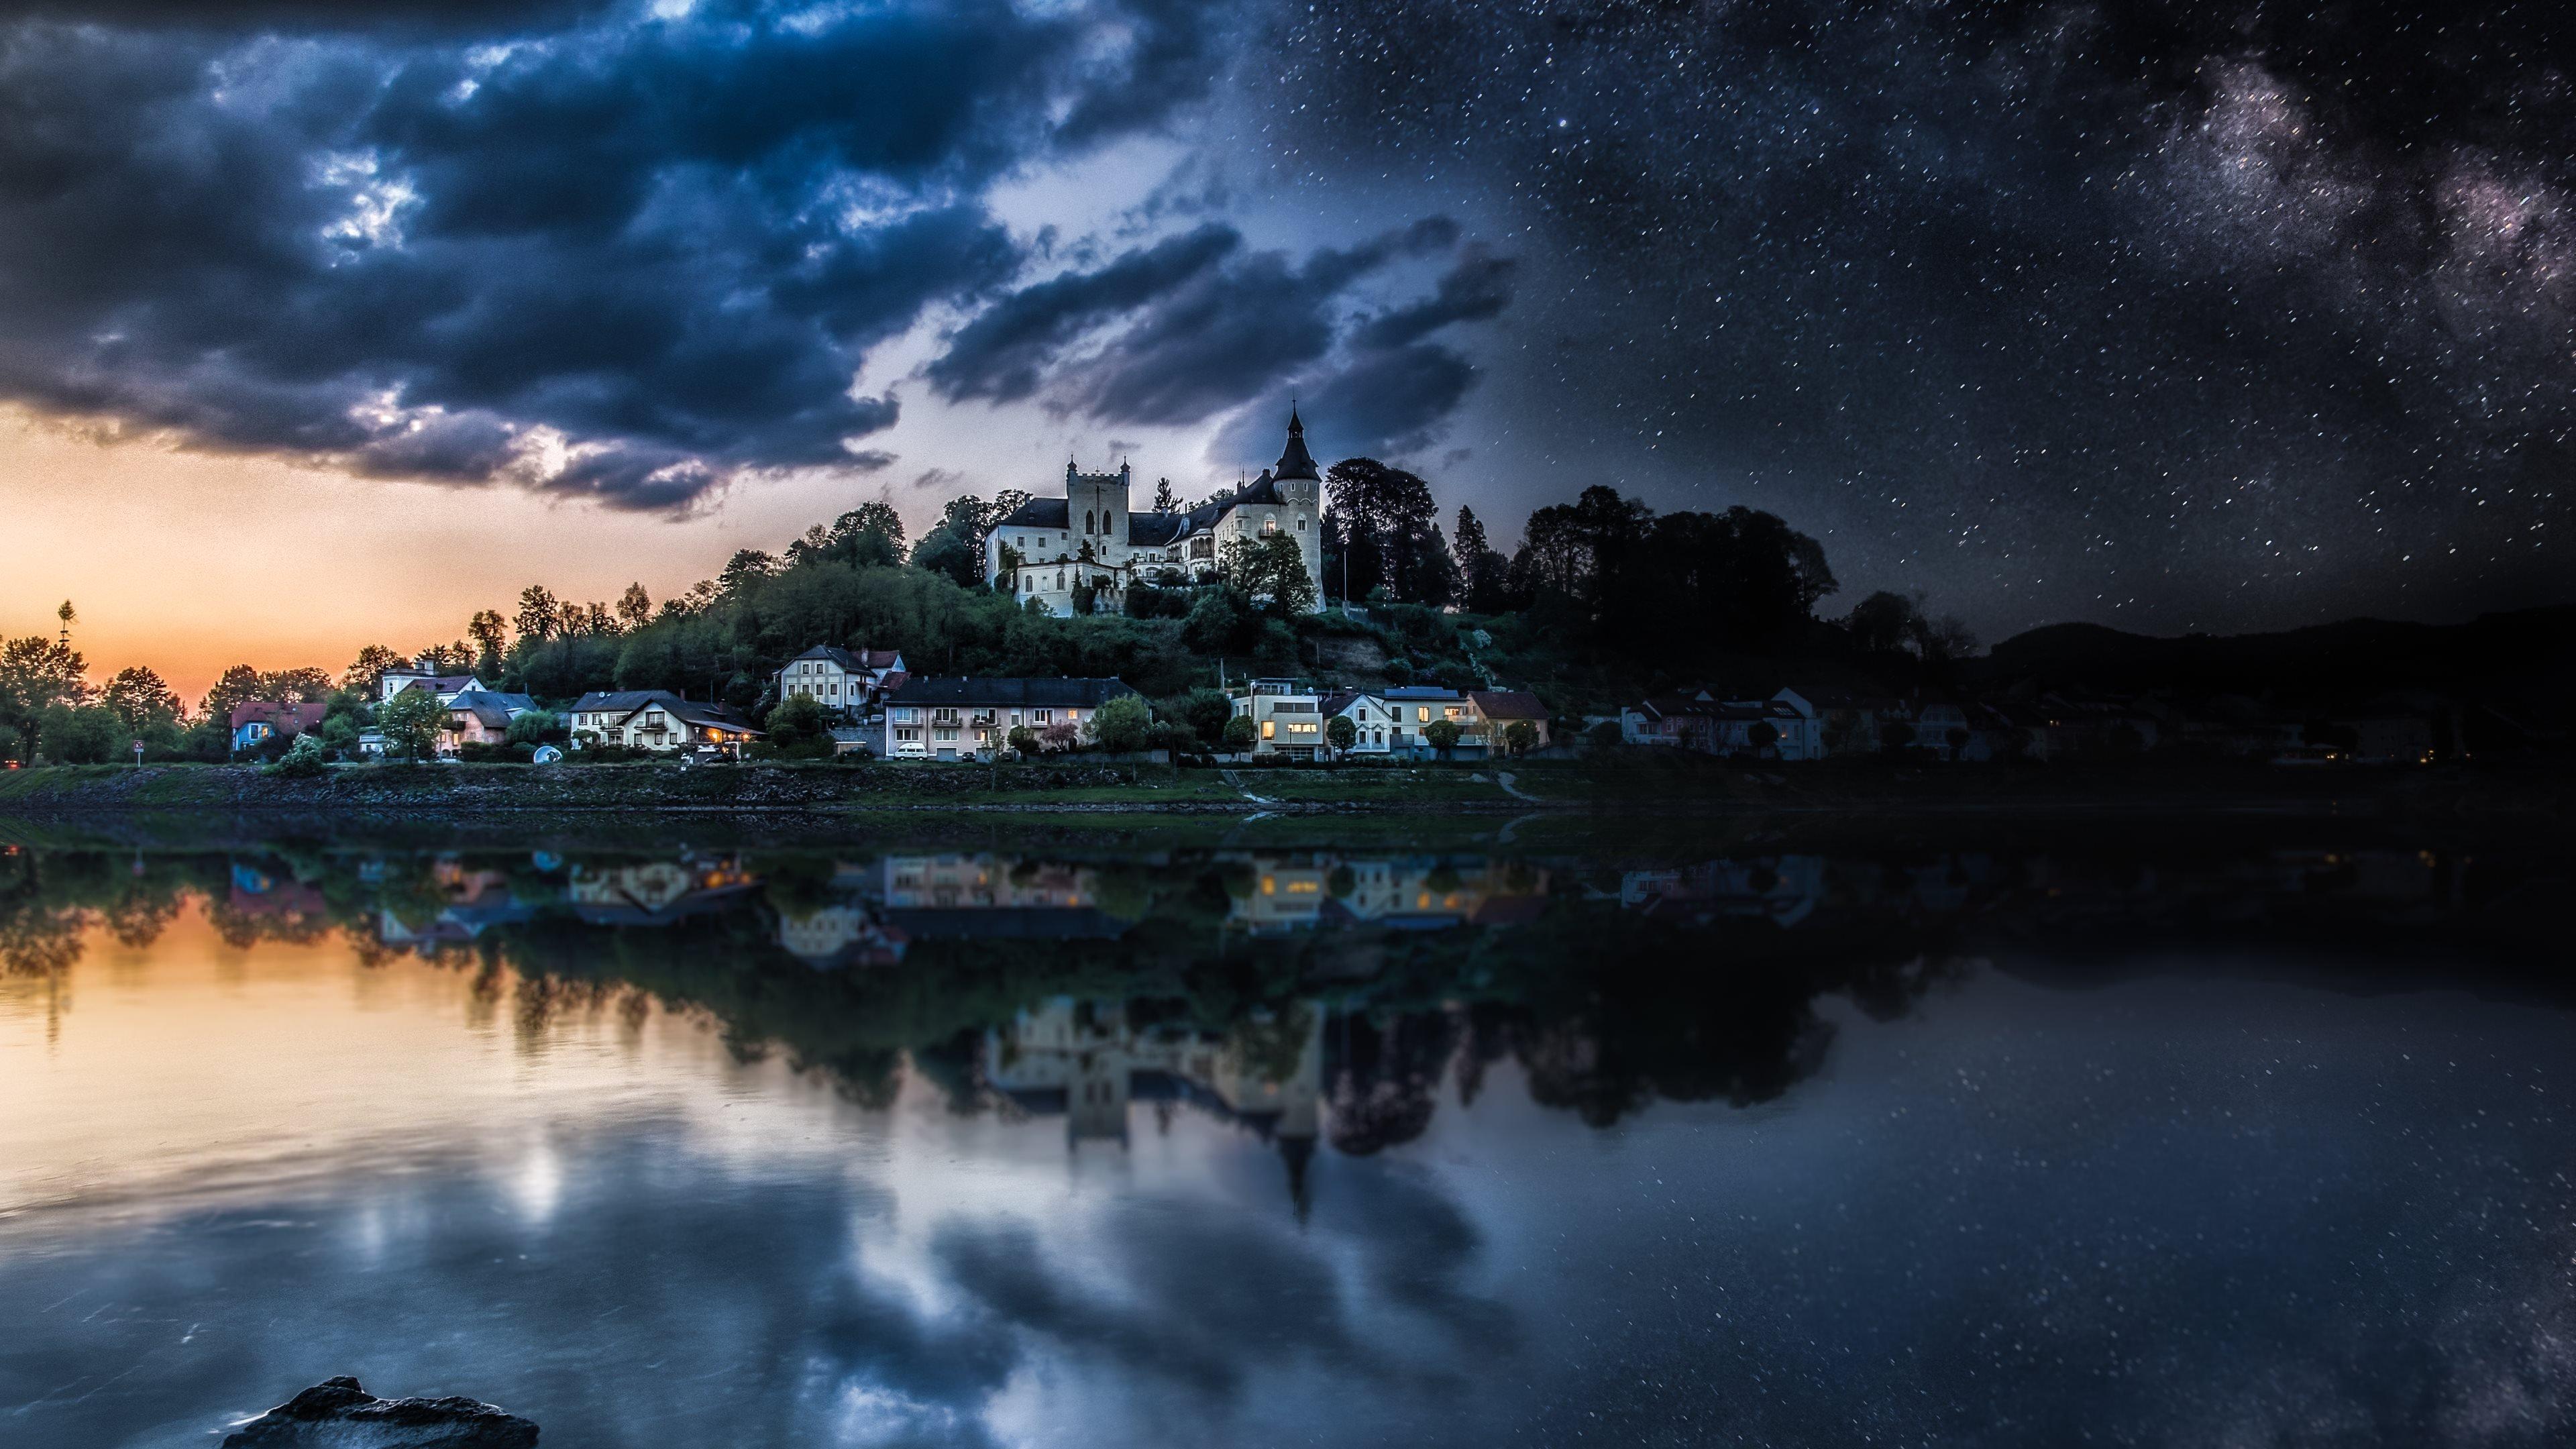 Starry Night 4k Night Sky Wallpaper Wallpapersafari